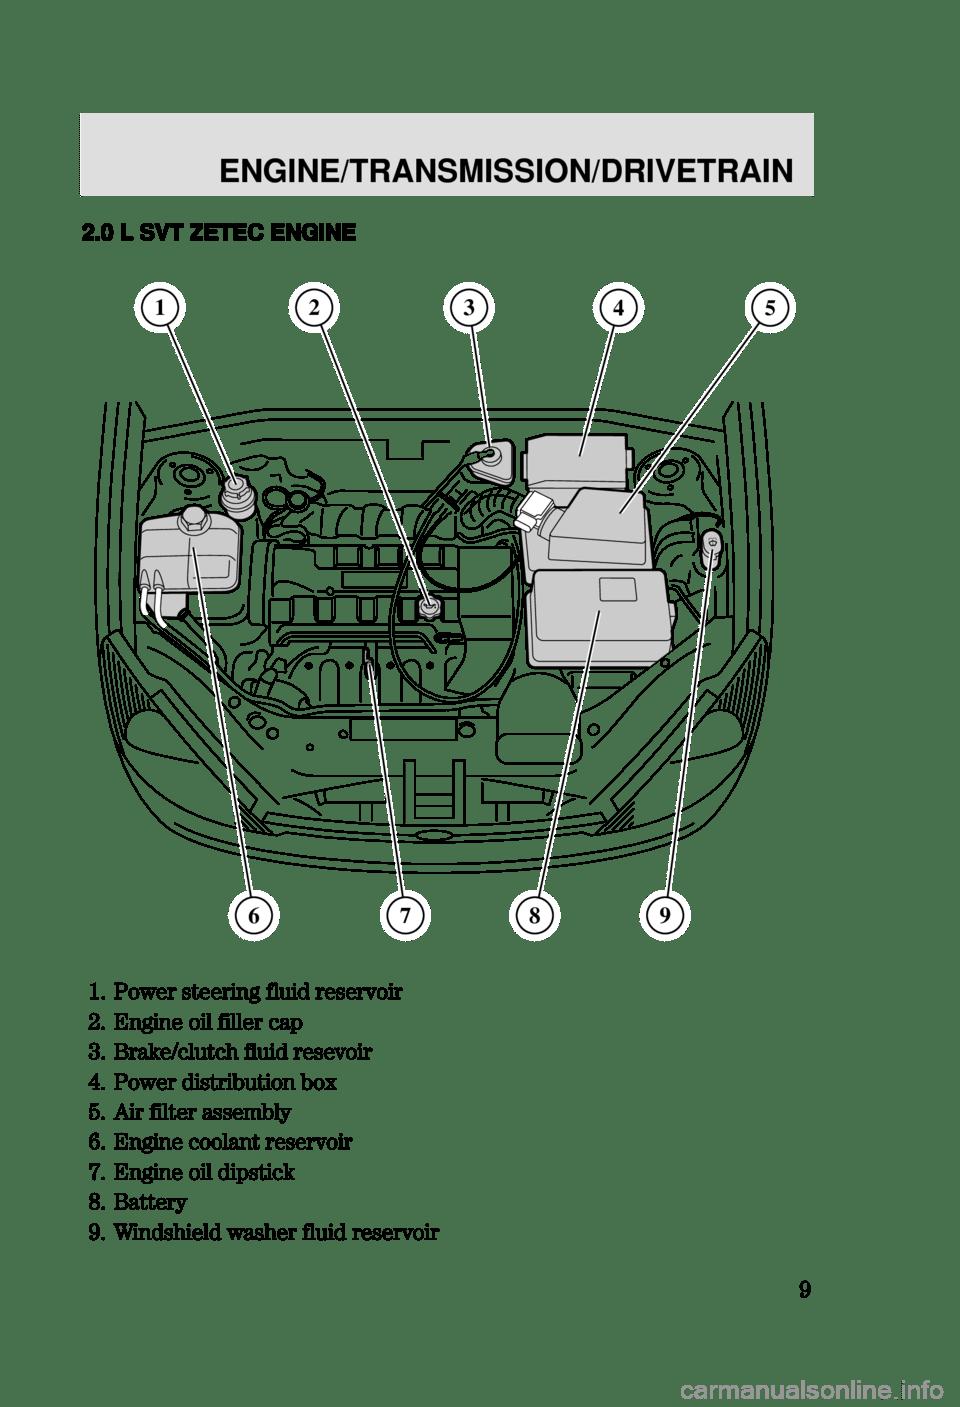 medium resolution of ford focus 2003 1 g svt supplement manual page 9 engine transmission drivetrain 8 2 0 l svt zetec engine